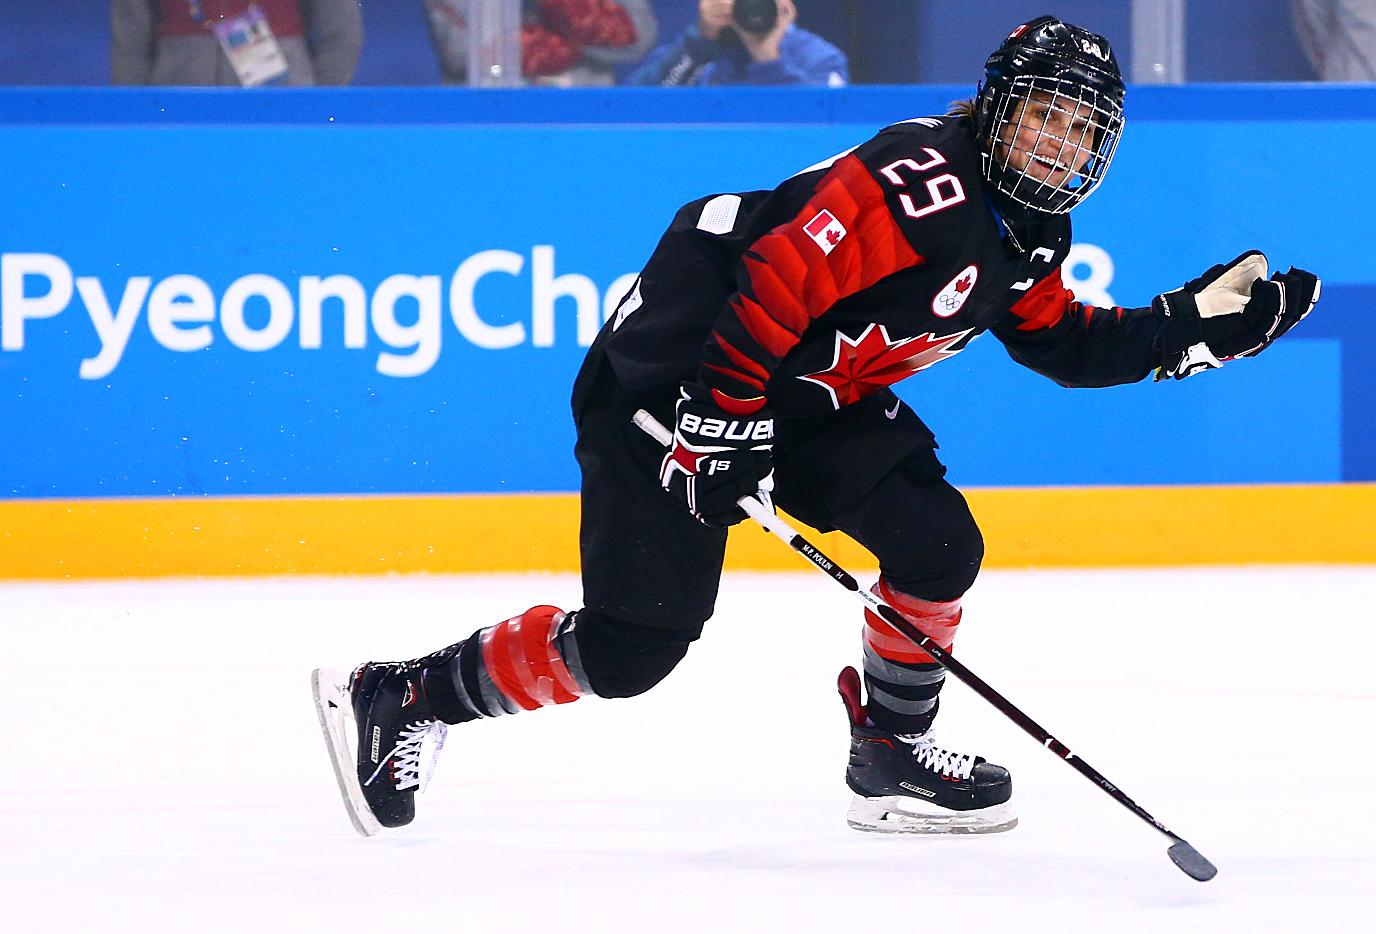 Team Canada Marie-Philip Poulin PyeongChang 2018